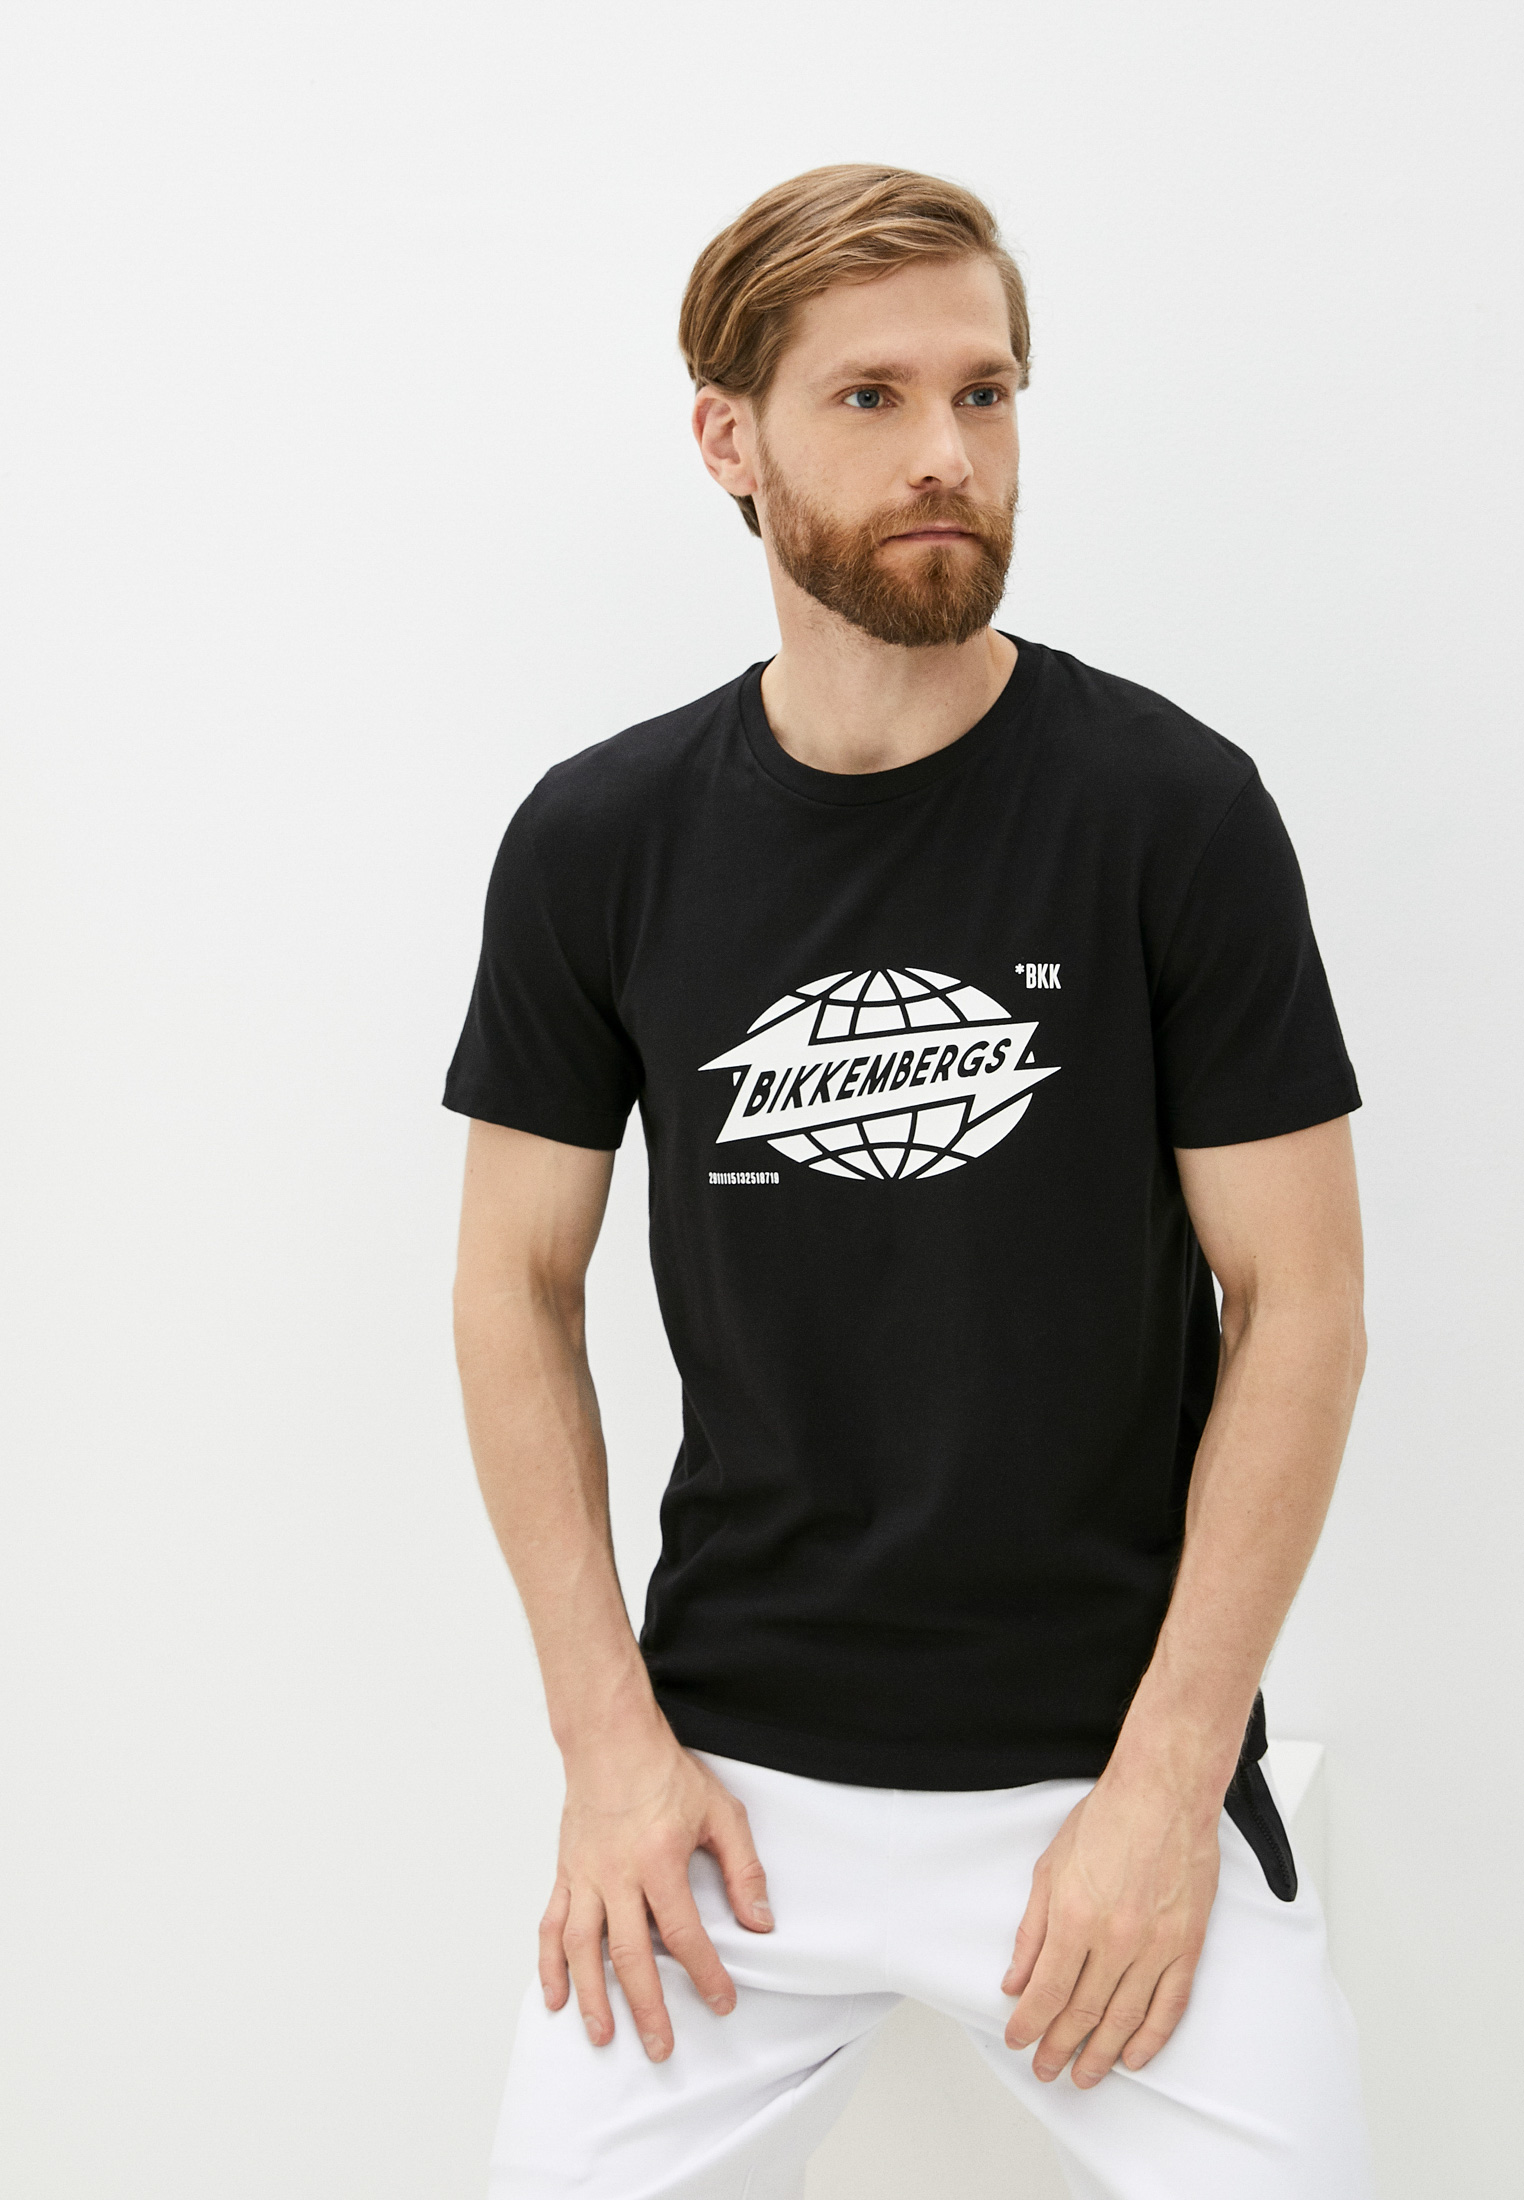 Мужская футболка Bikkembergs (Биккембергс) C 4 101 42 E 2273